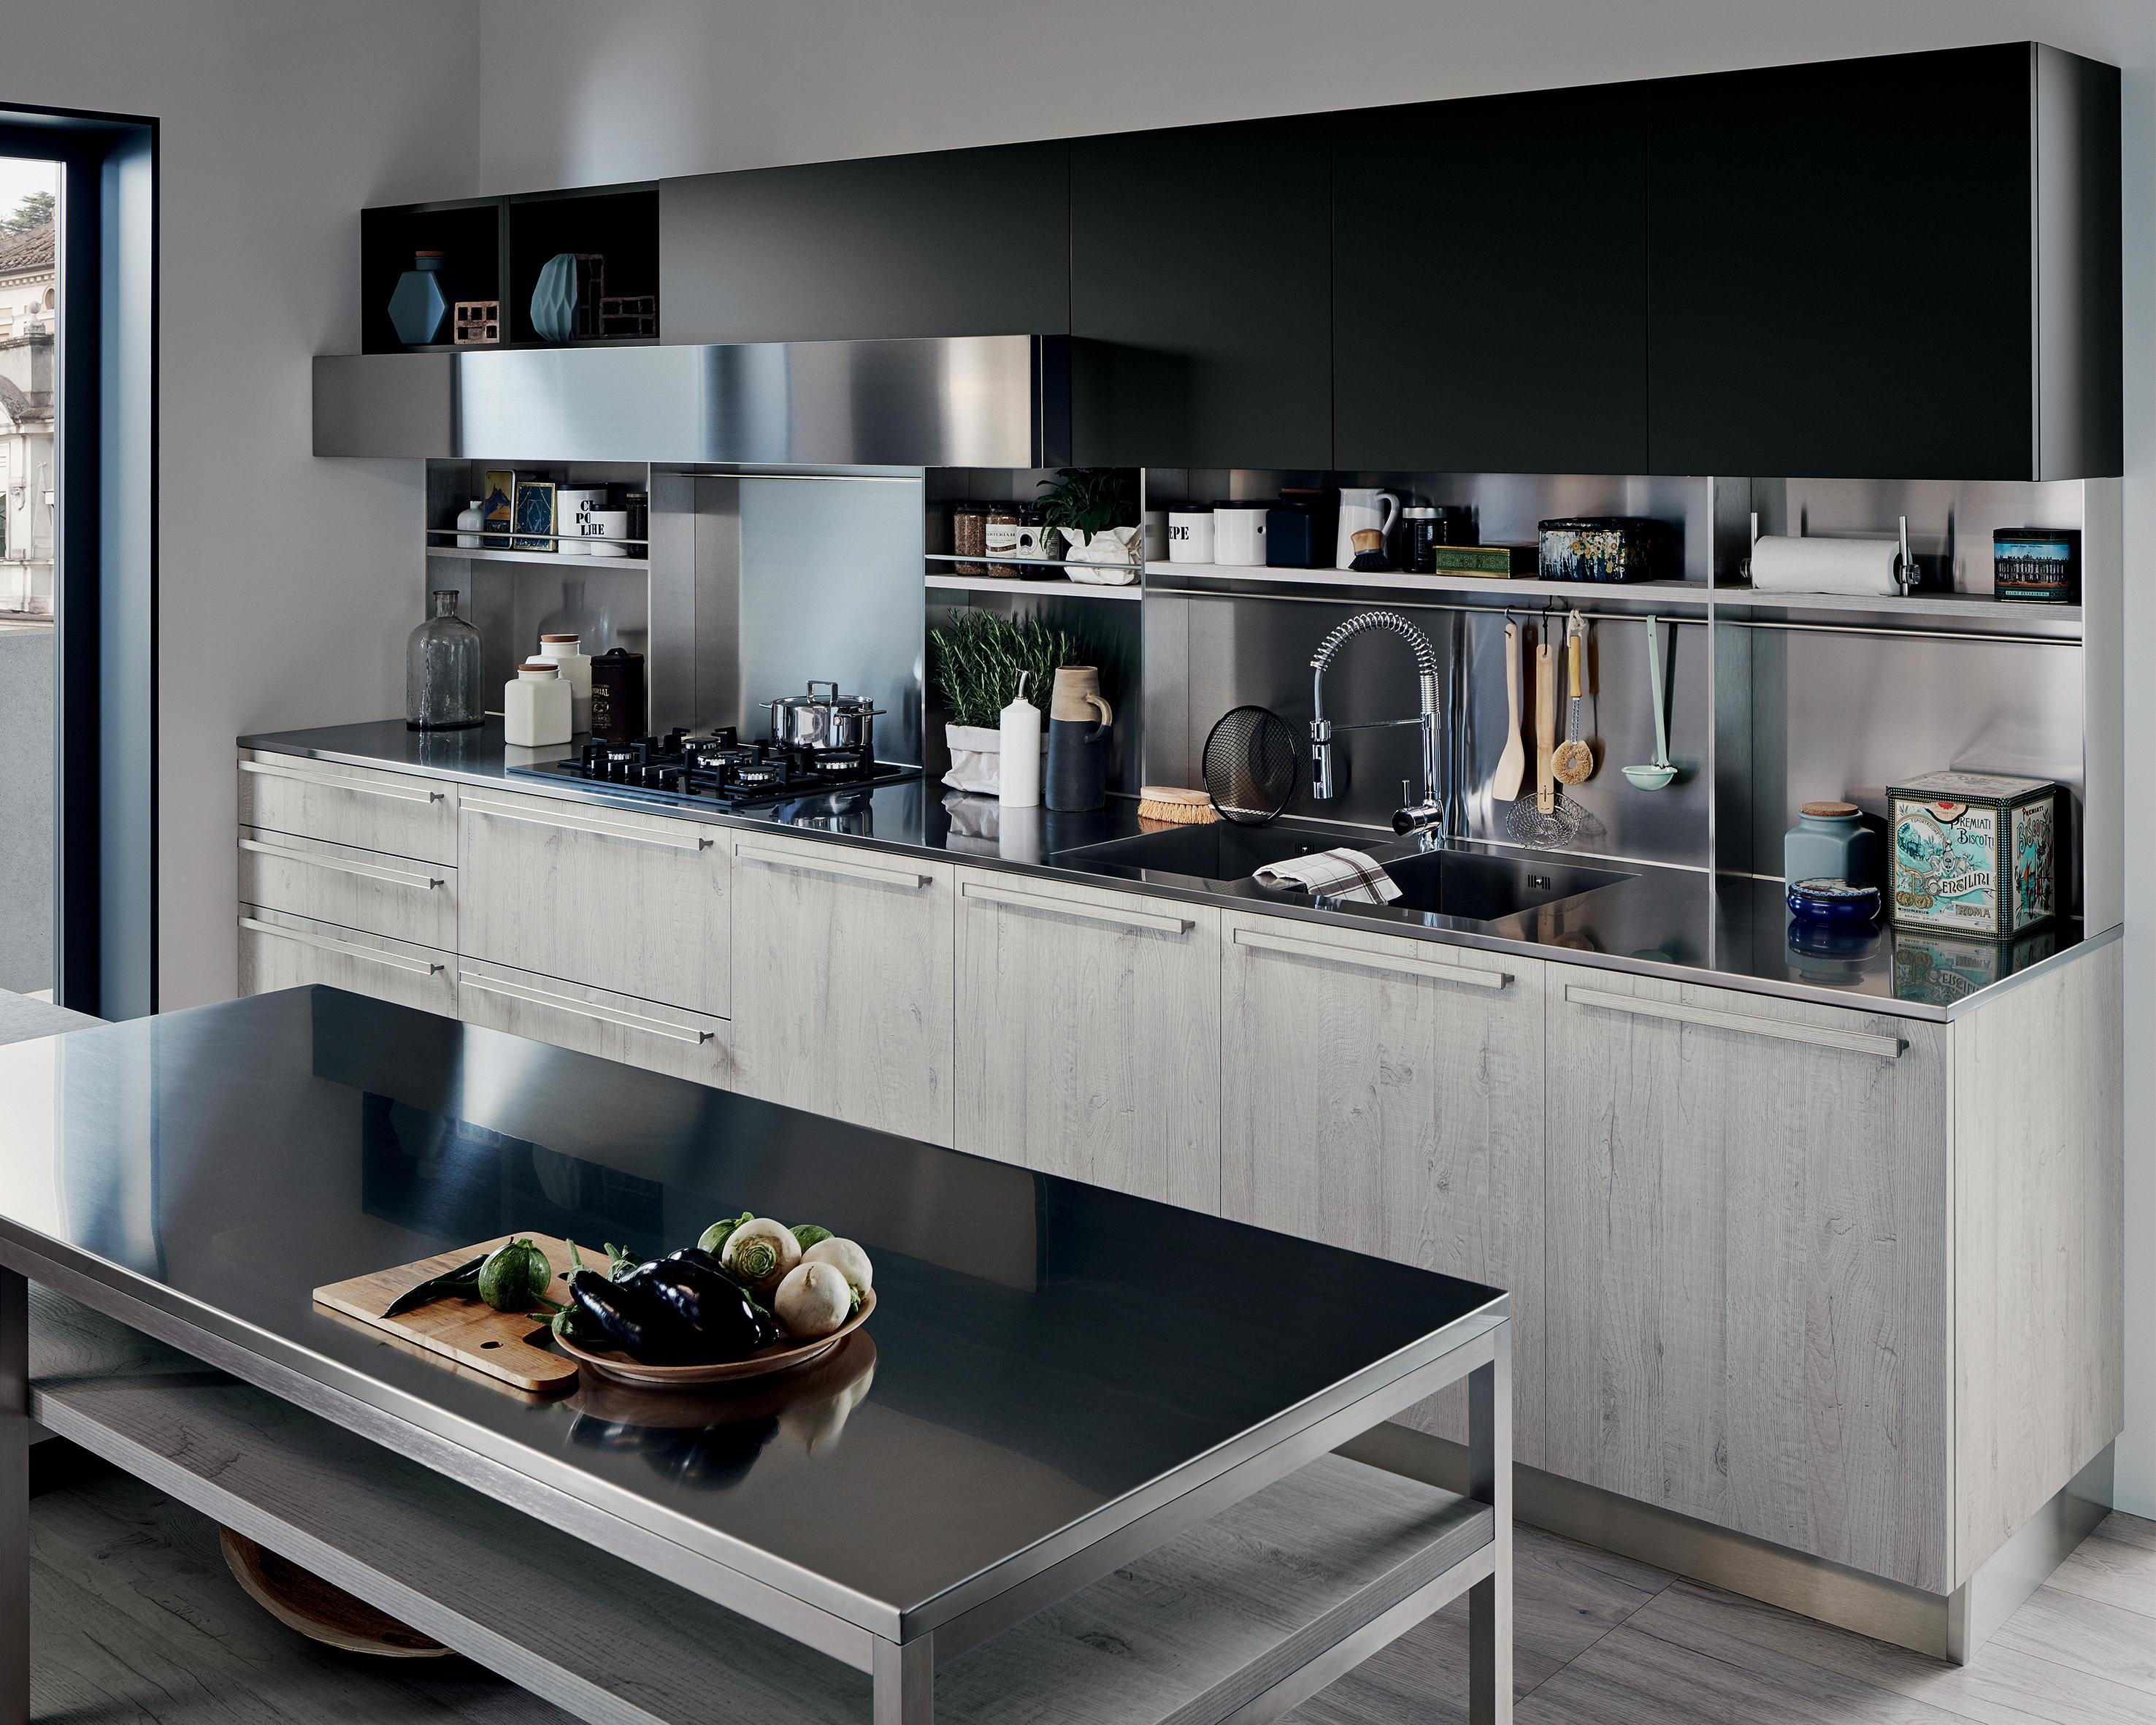 Ethica cucine a parete veneta cucine architonic - Cucine a parete ...